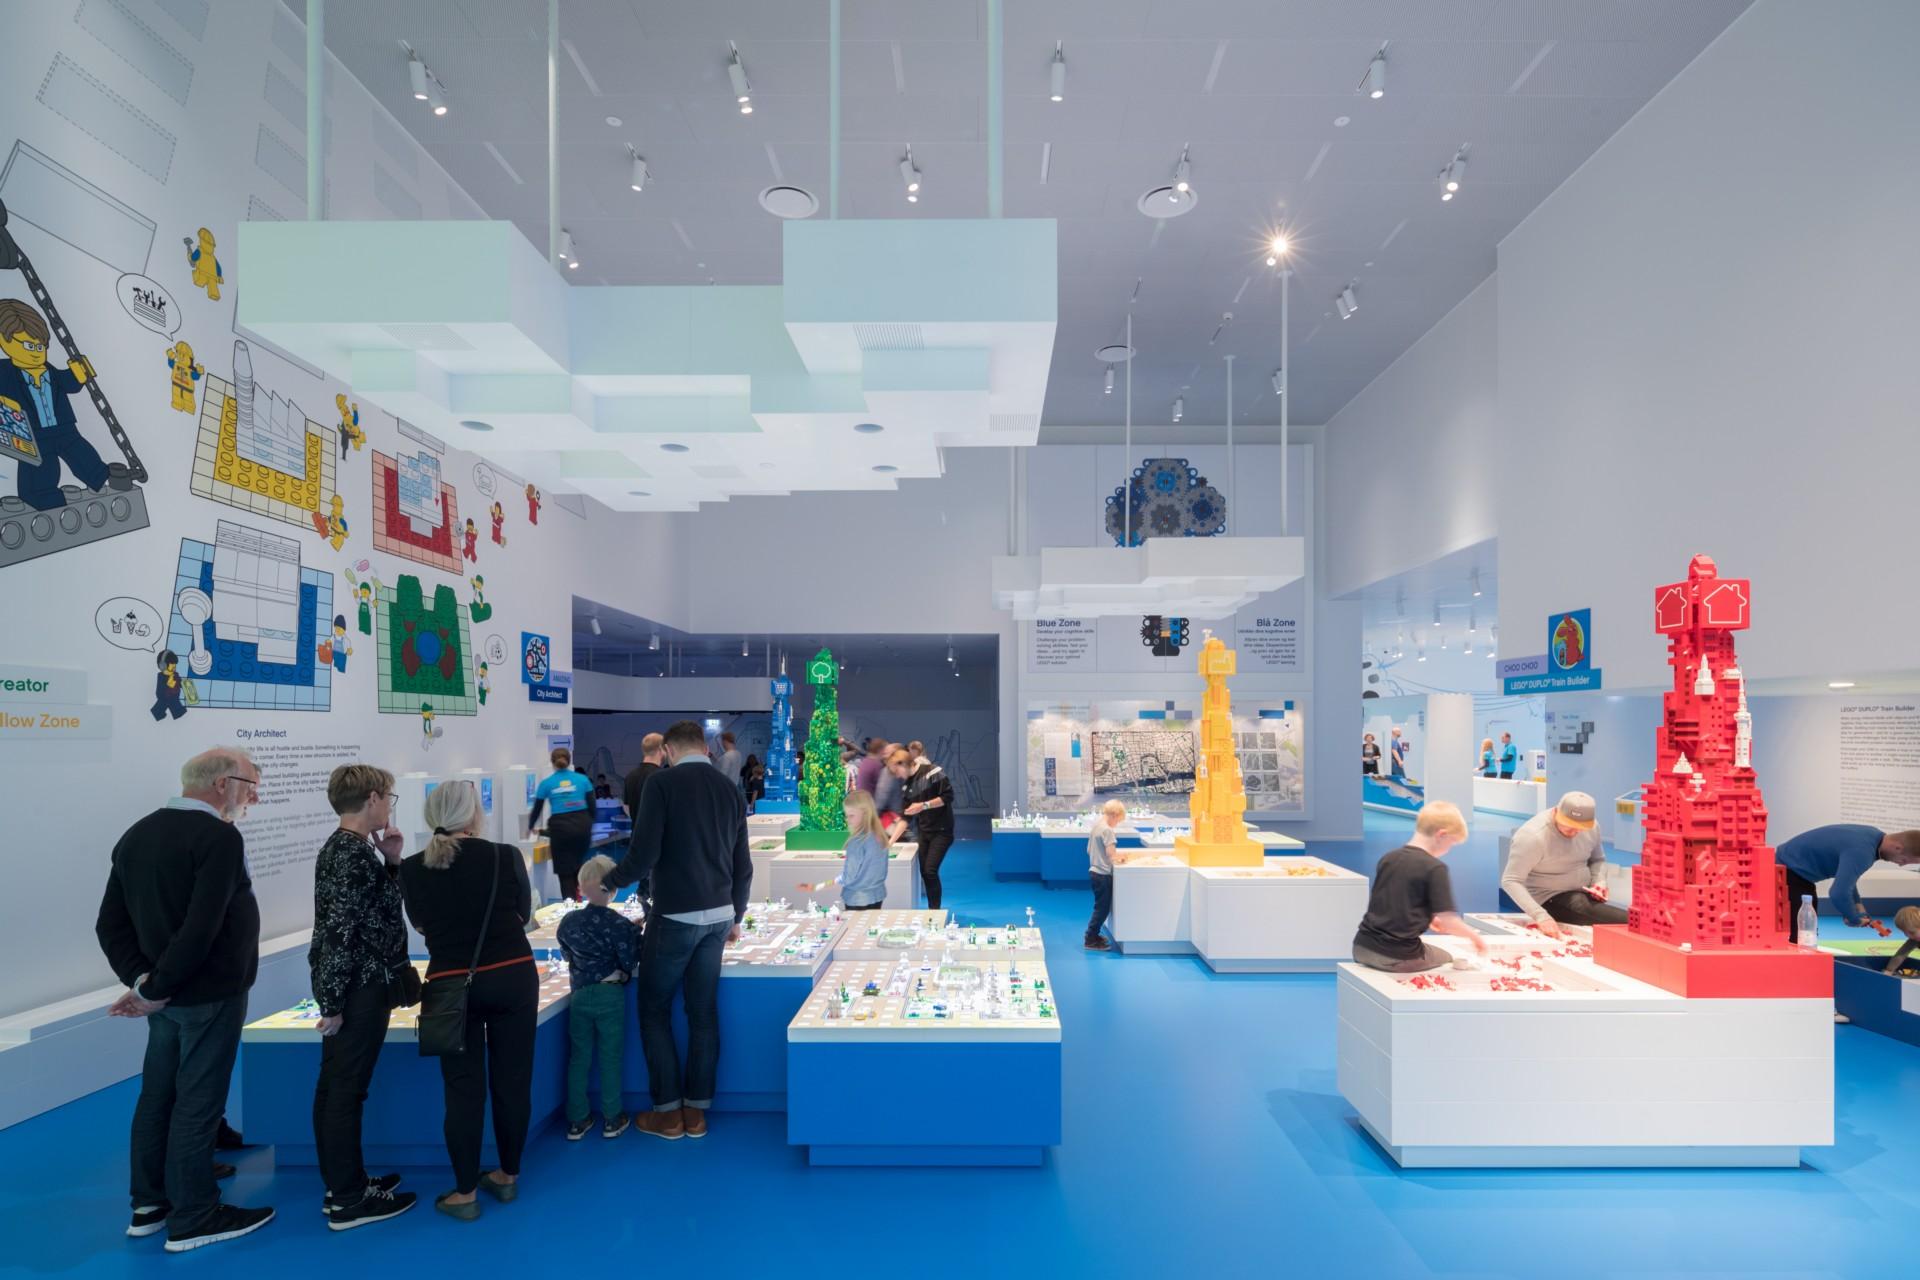 BIG Bjarke Ingels Group: The Lego Brick House Billund Denmark